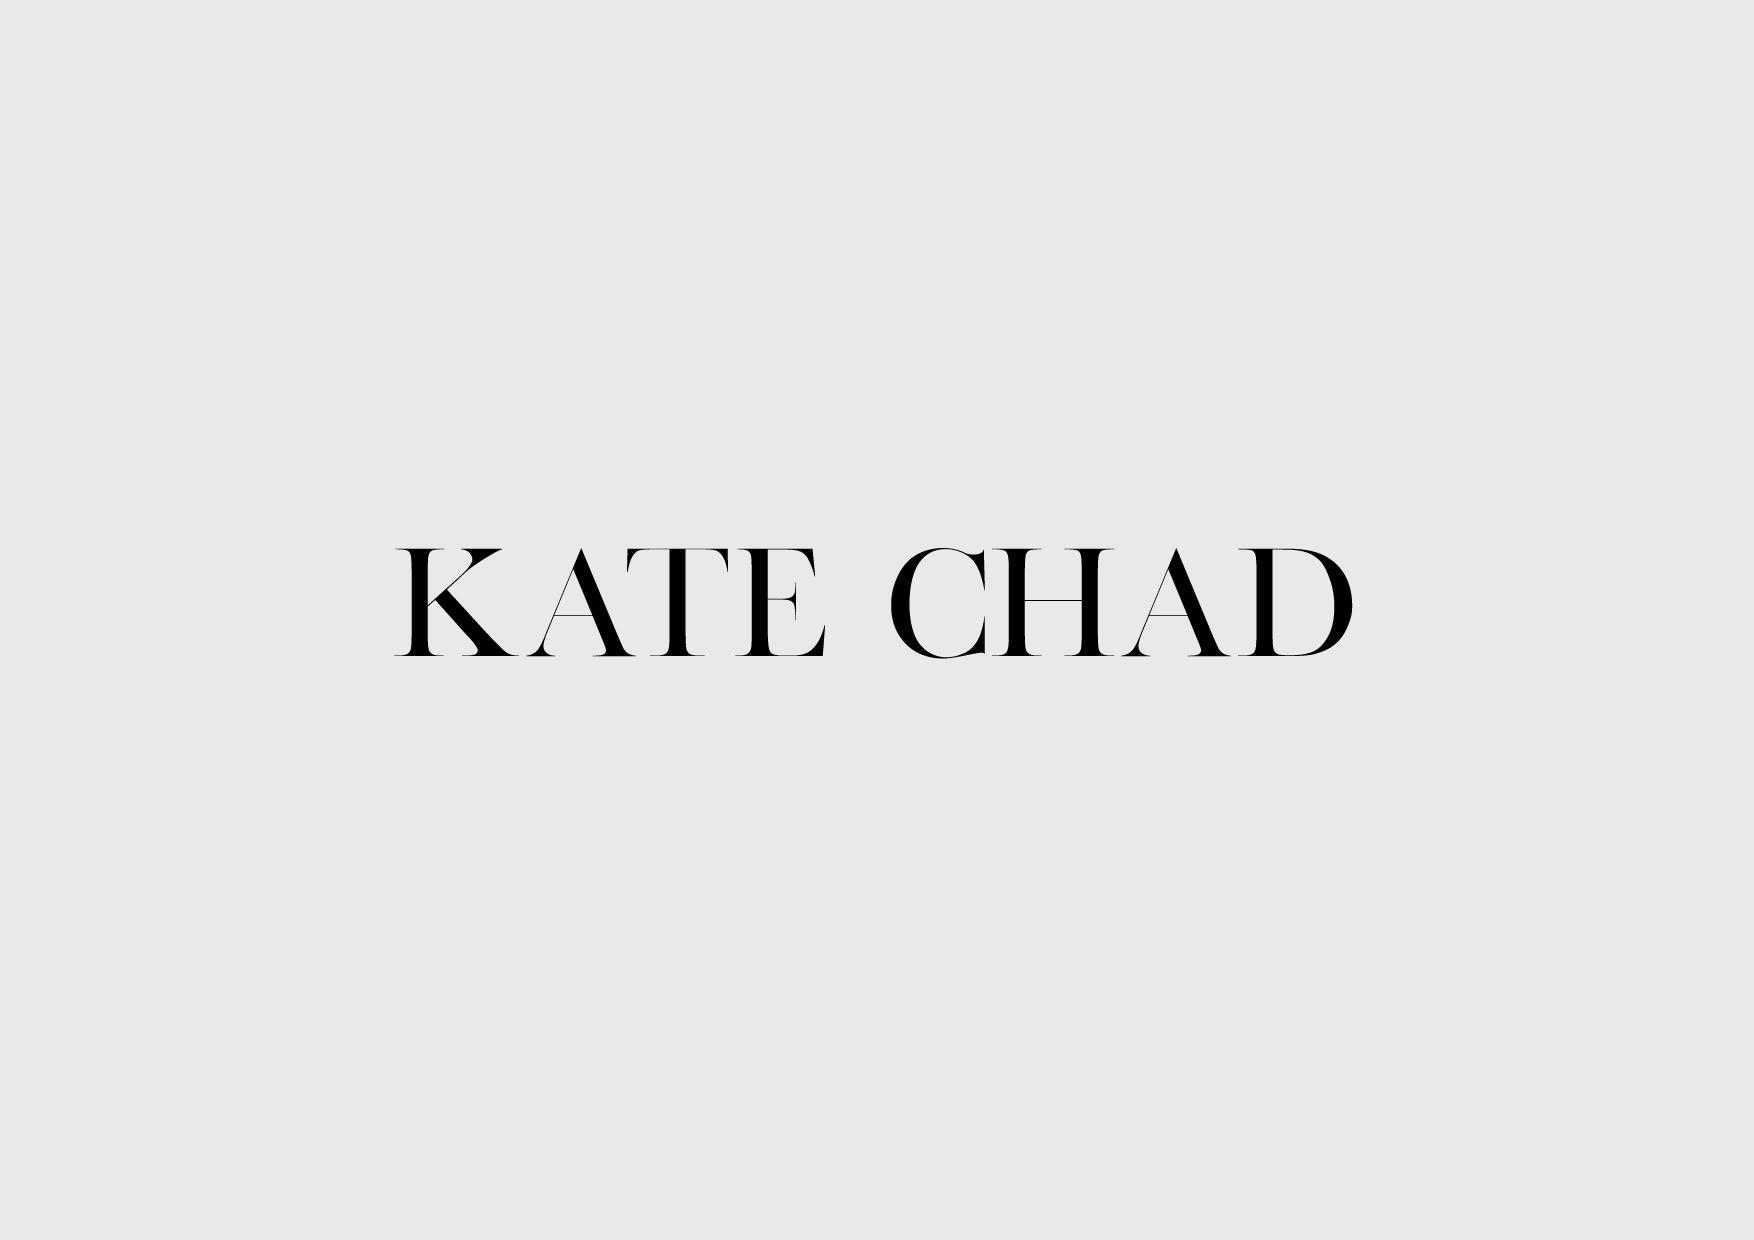 Kate Chad Logo Concept 2_2.jpg